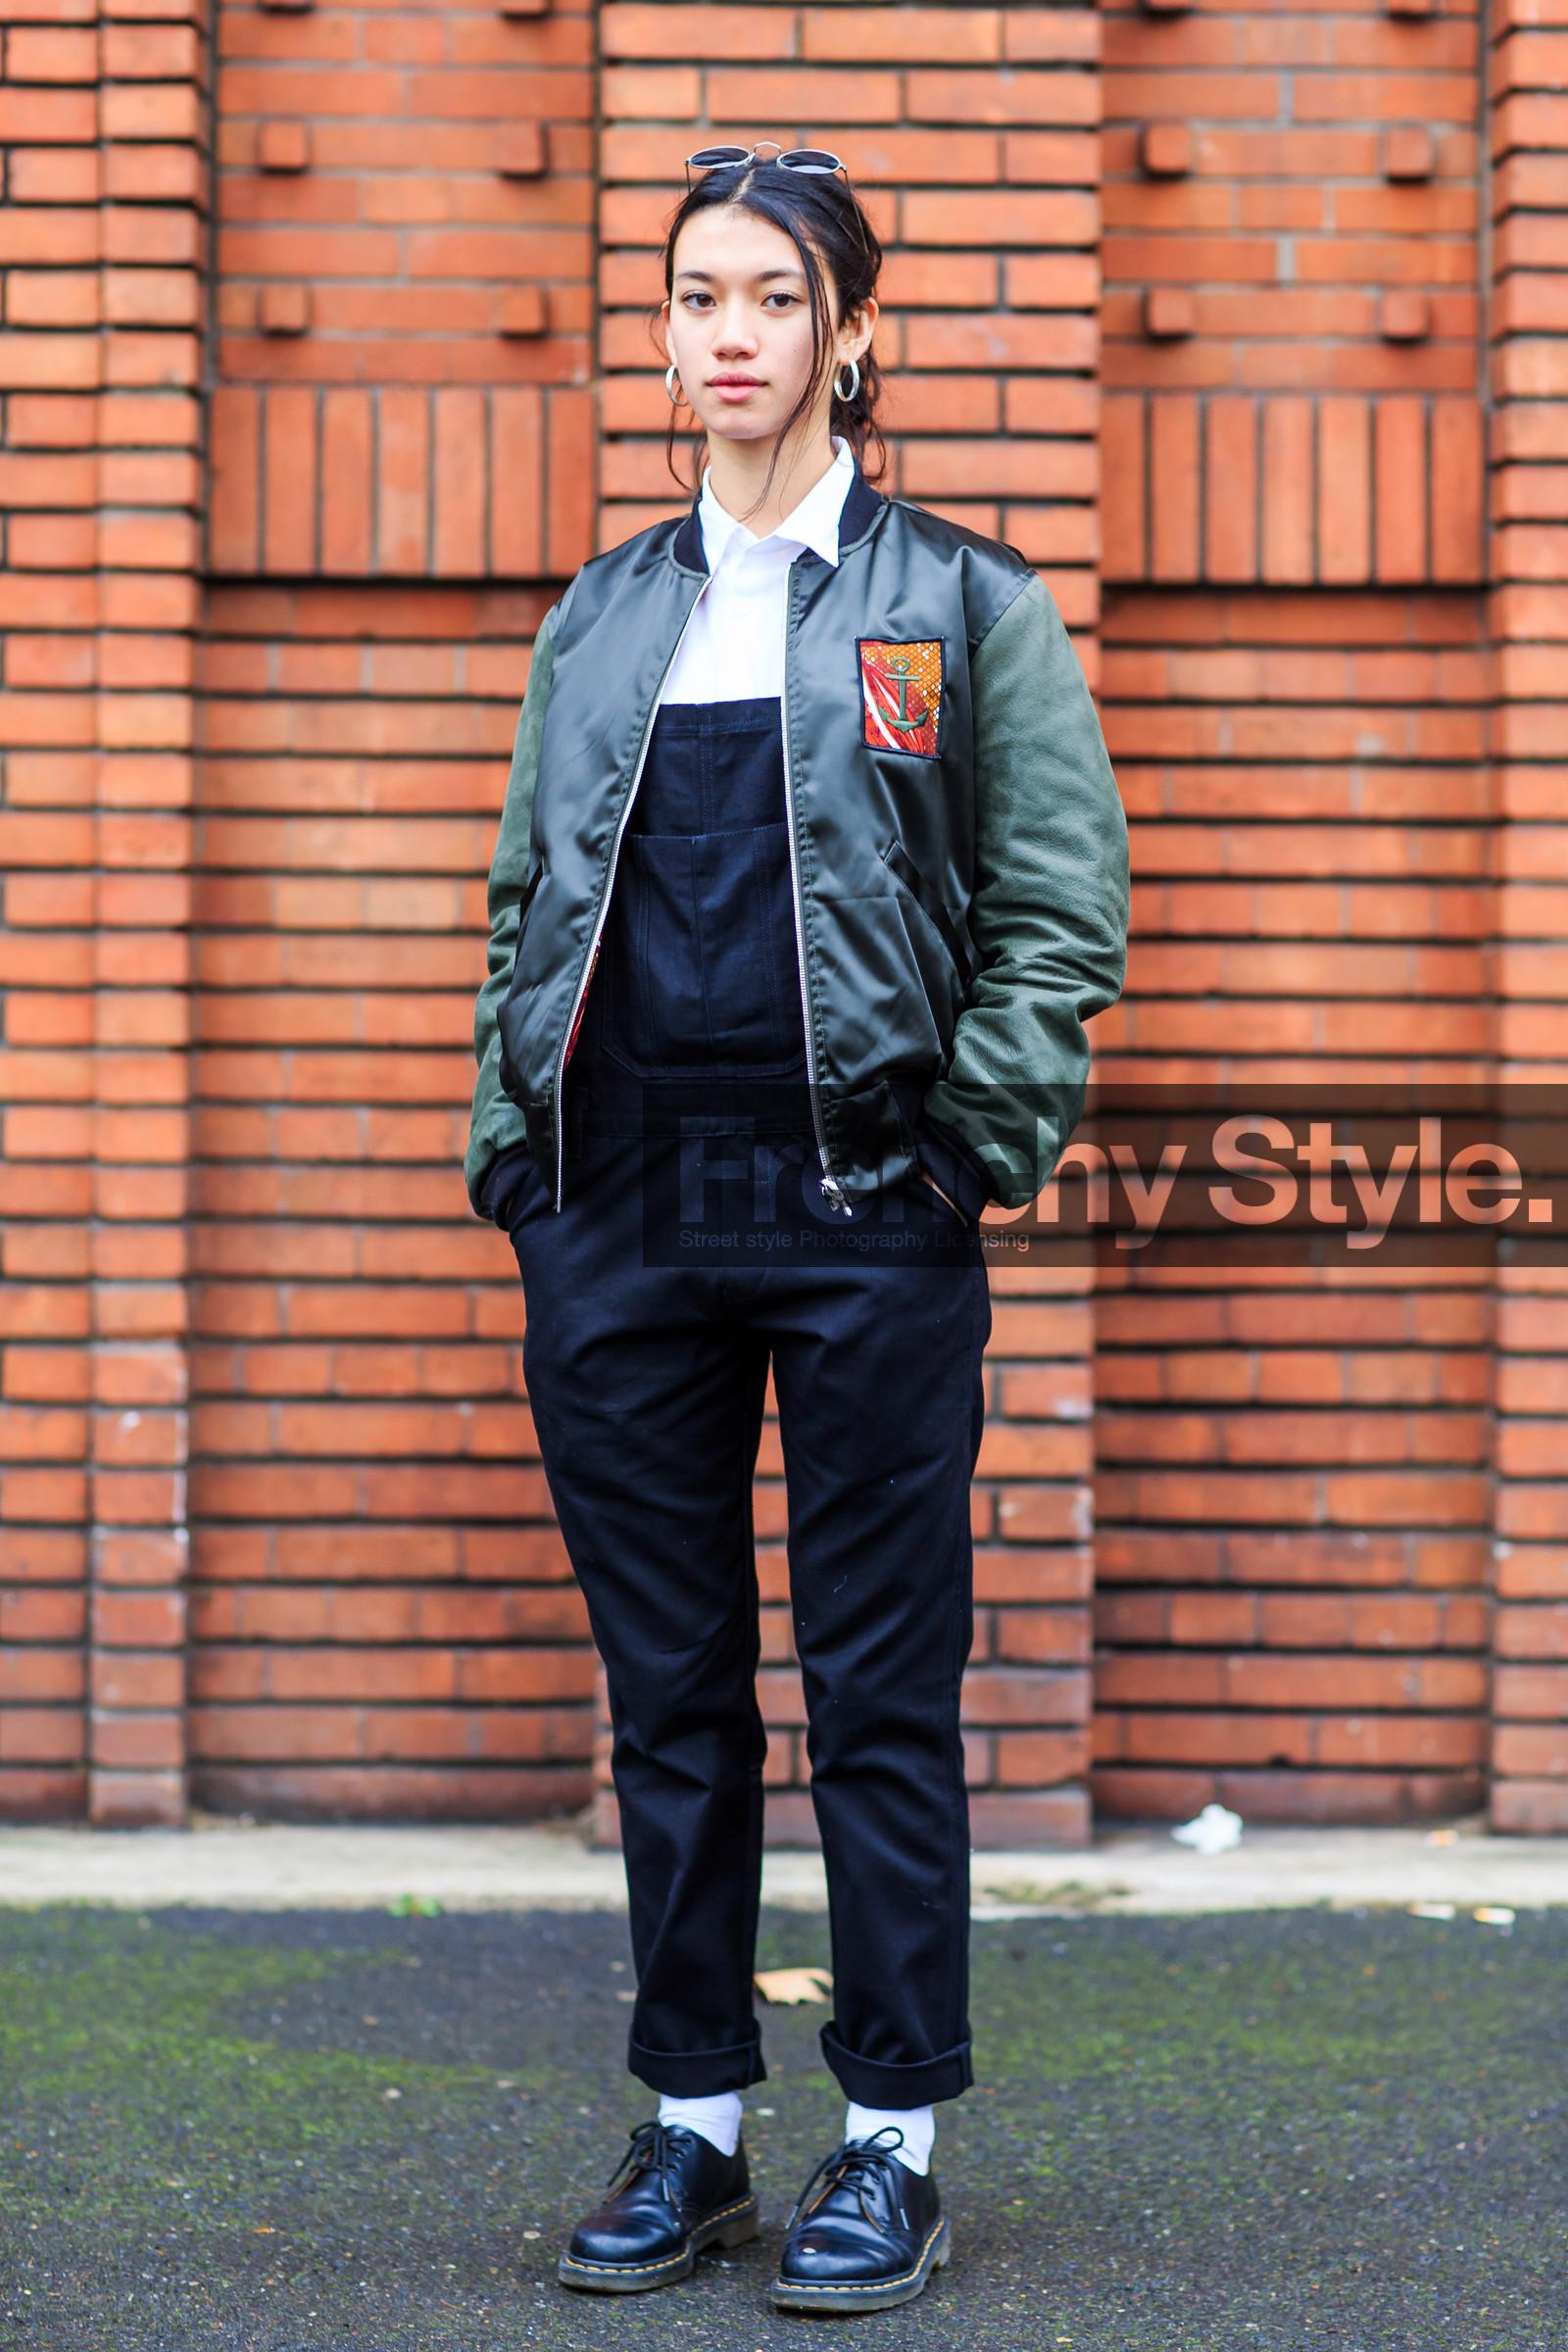 beebd33f2c81 Frenchy style street style jonathan paciullo jpg 1600x2400 Black jacket  shoes